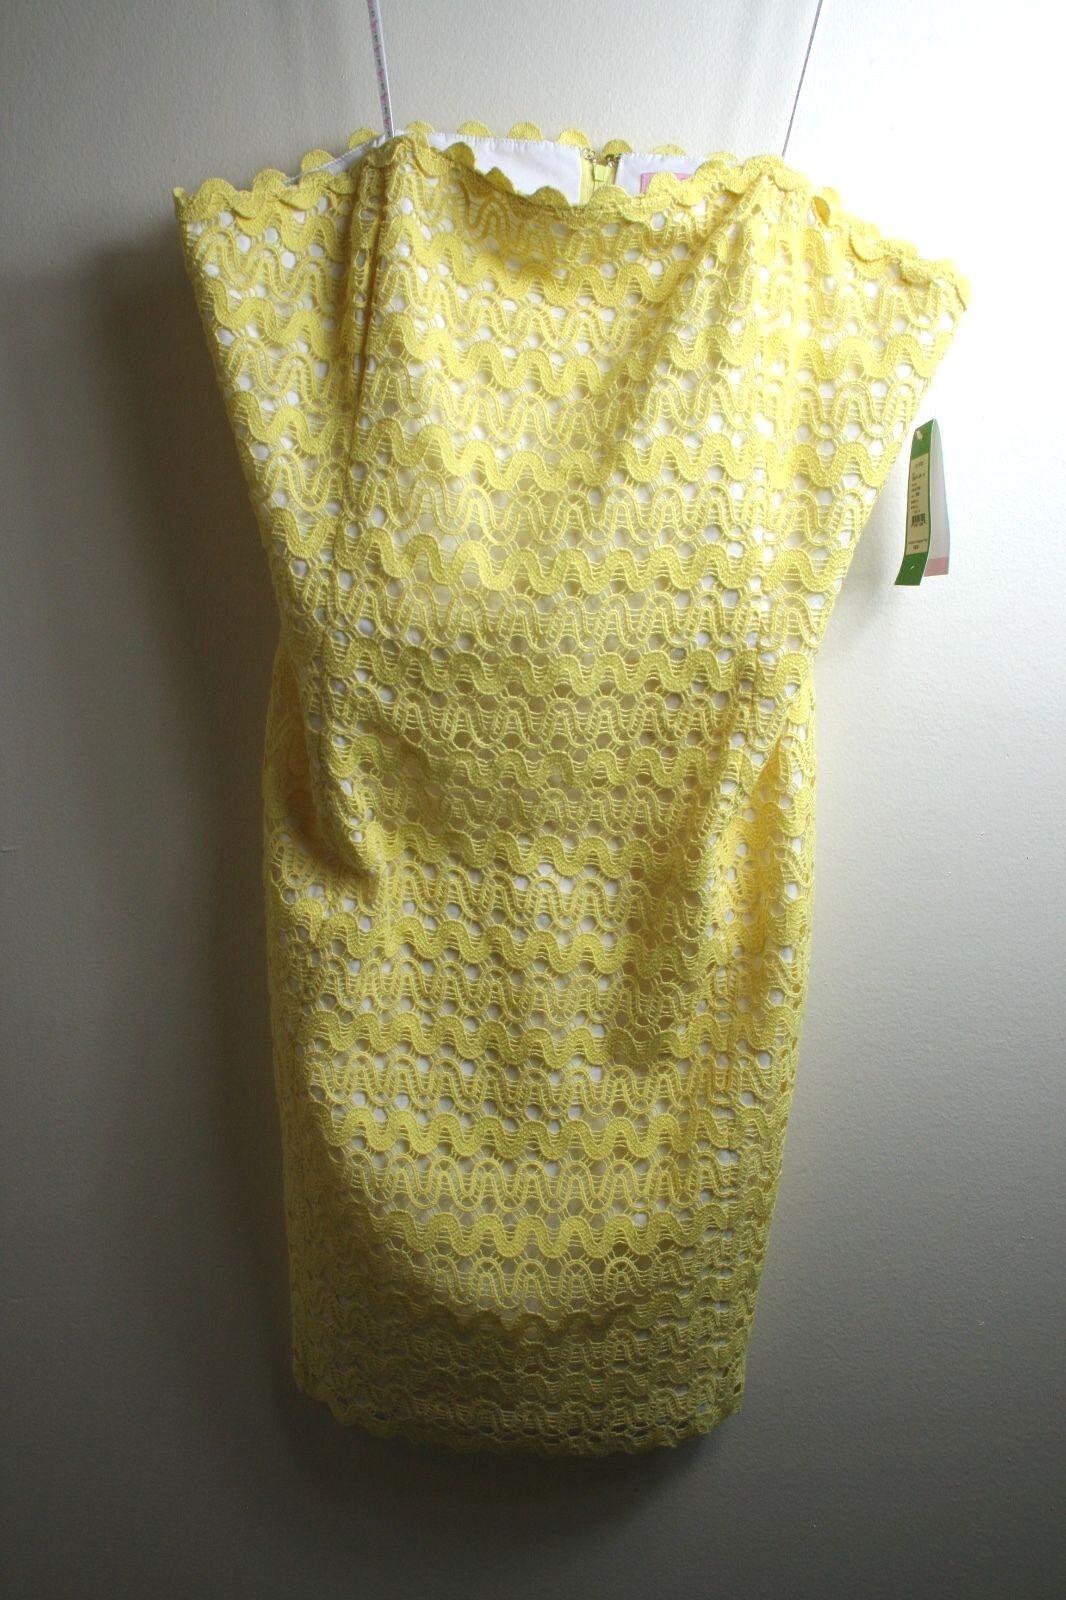 298 Lilly Pulitzer Lakeland Starfruit Yellow Ric Rac Lace Strapless Dress 14